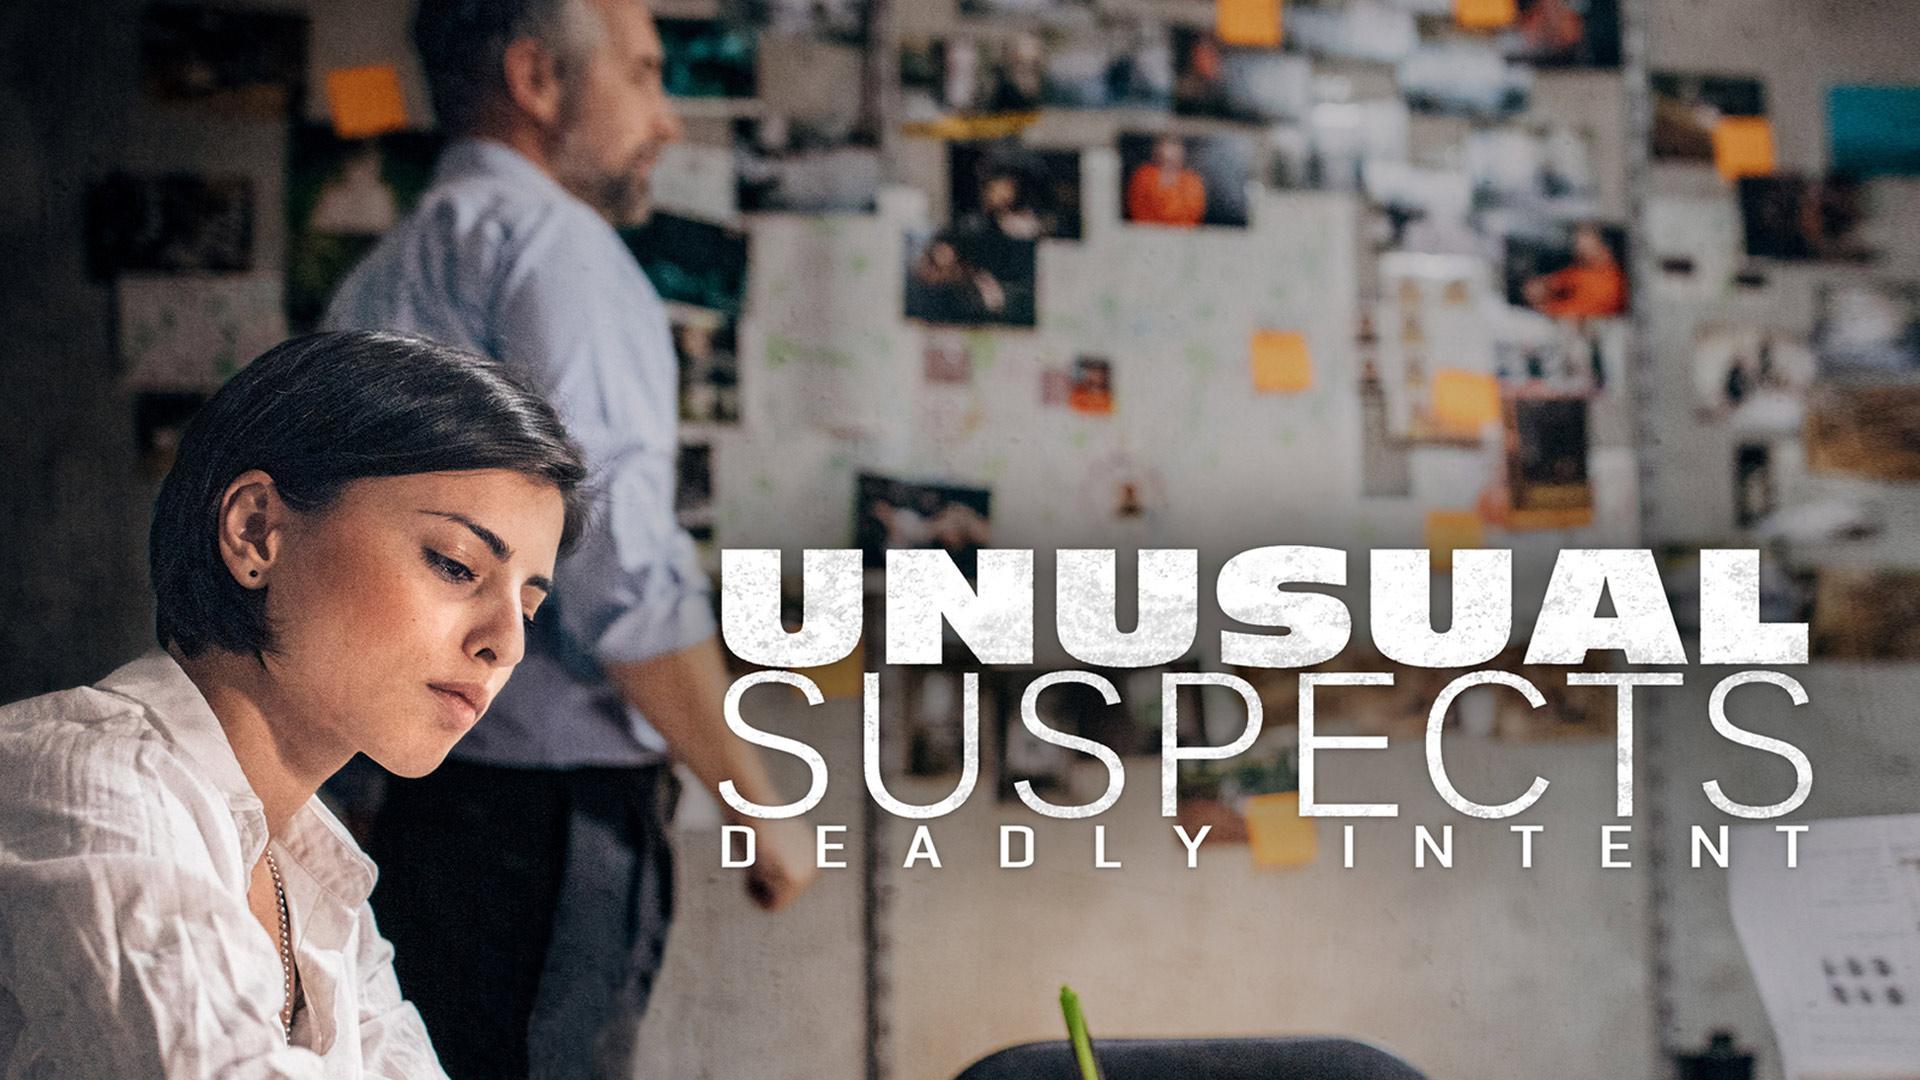 Unusual Suspects: Deadly Intent - Season 1